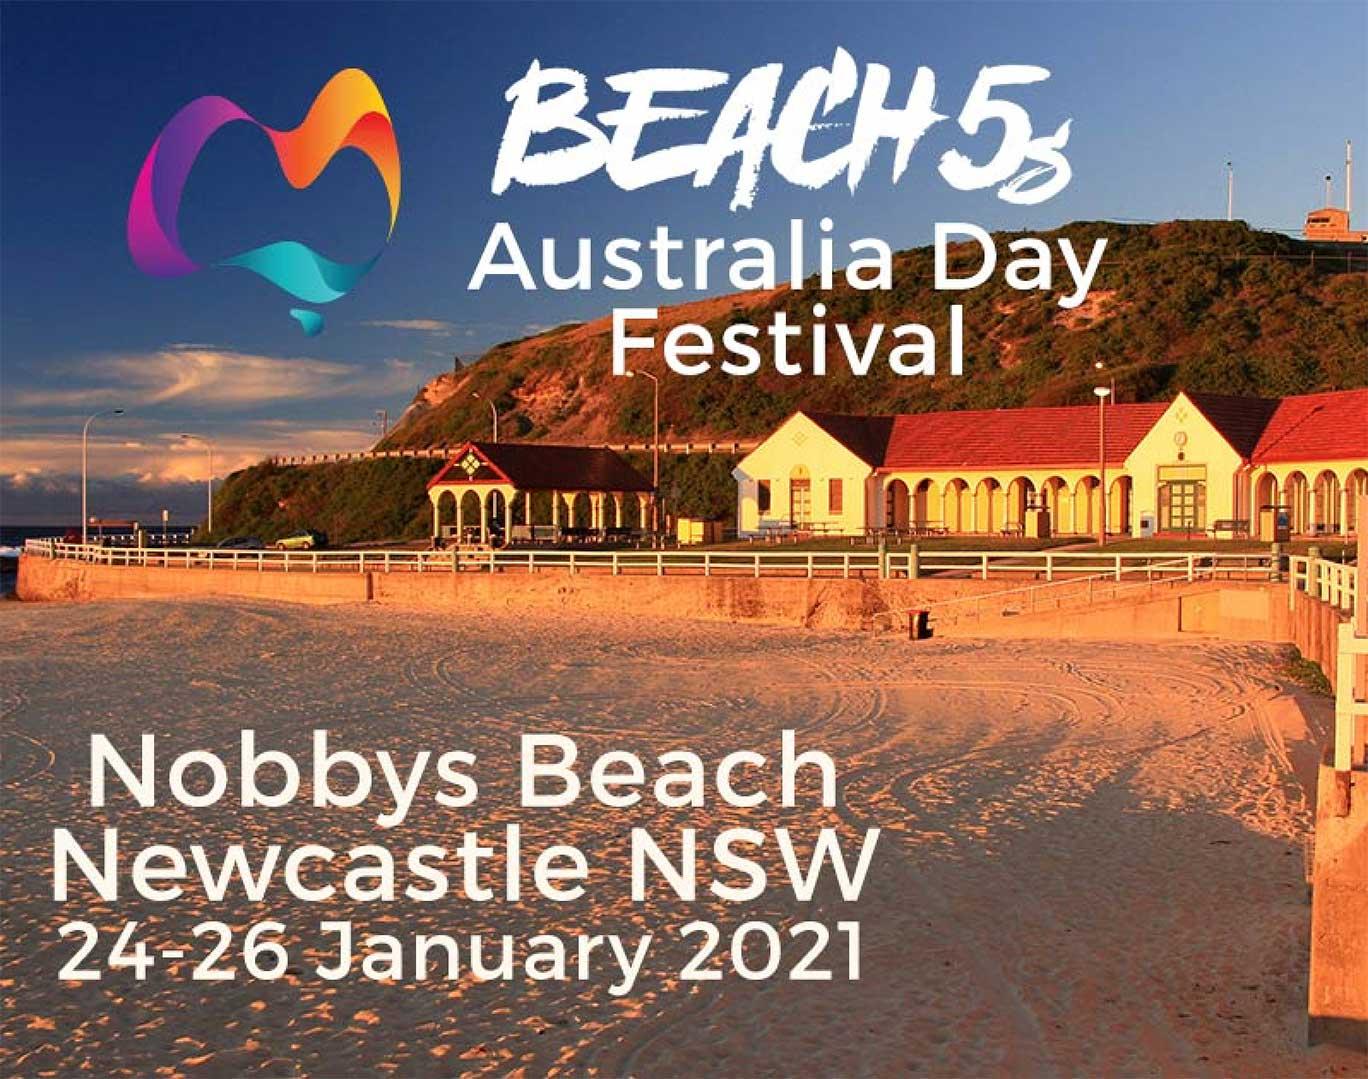 beach 5s rugby Australia Day Festival 2021